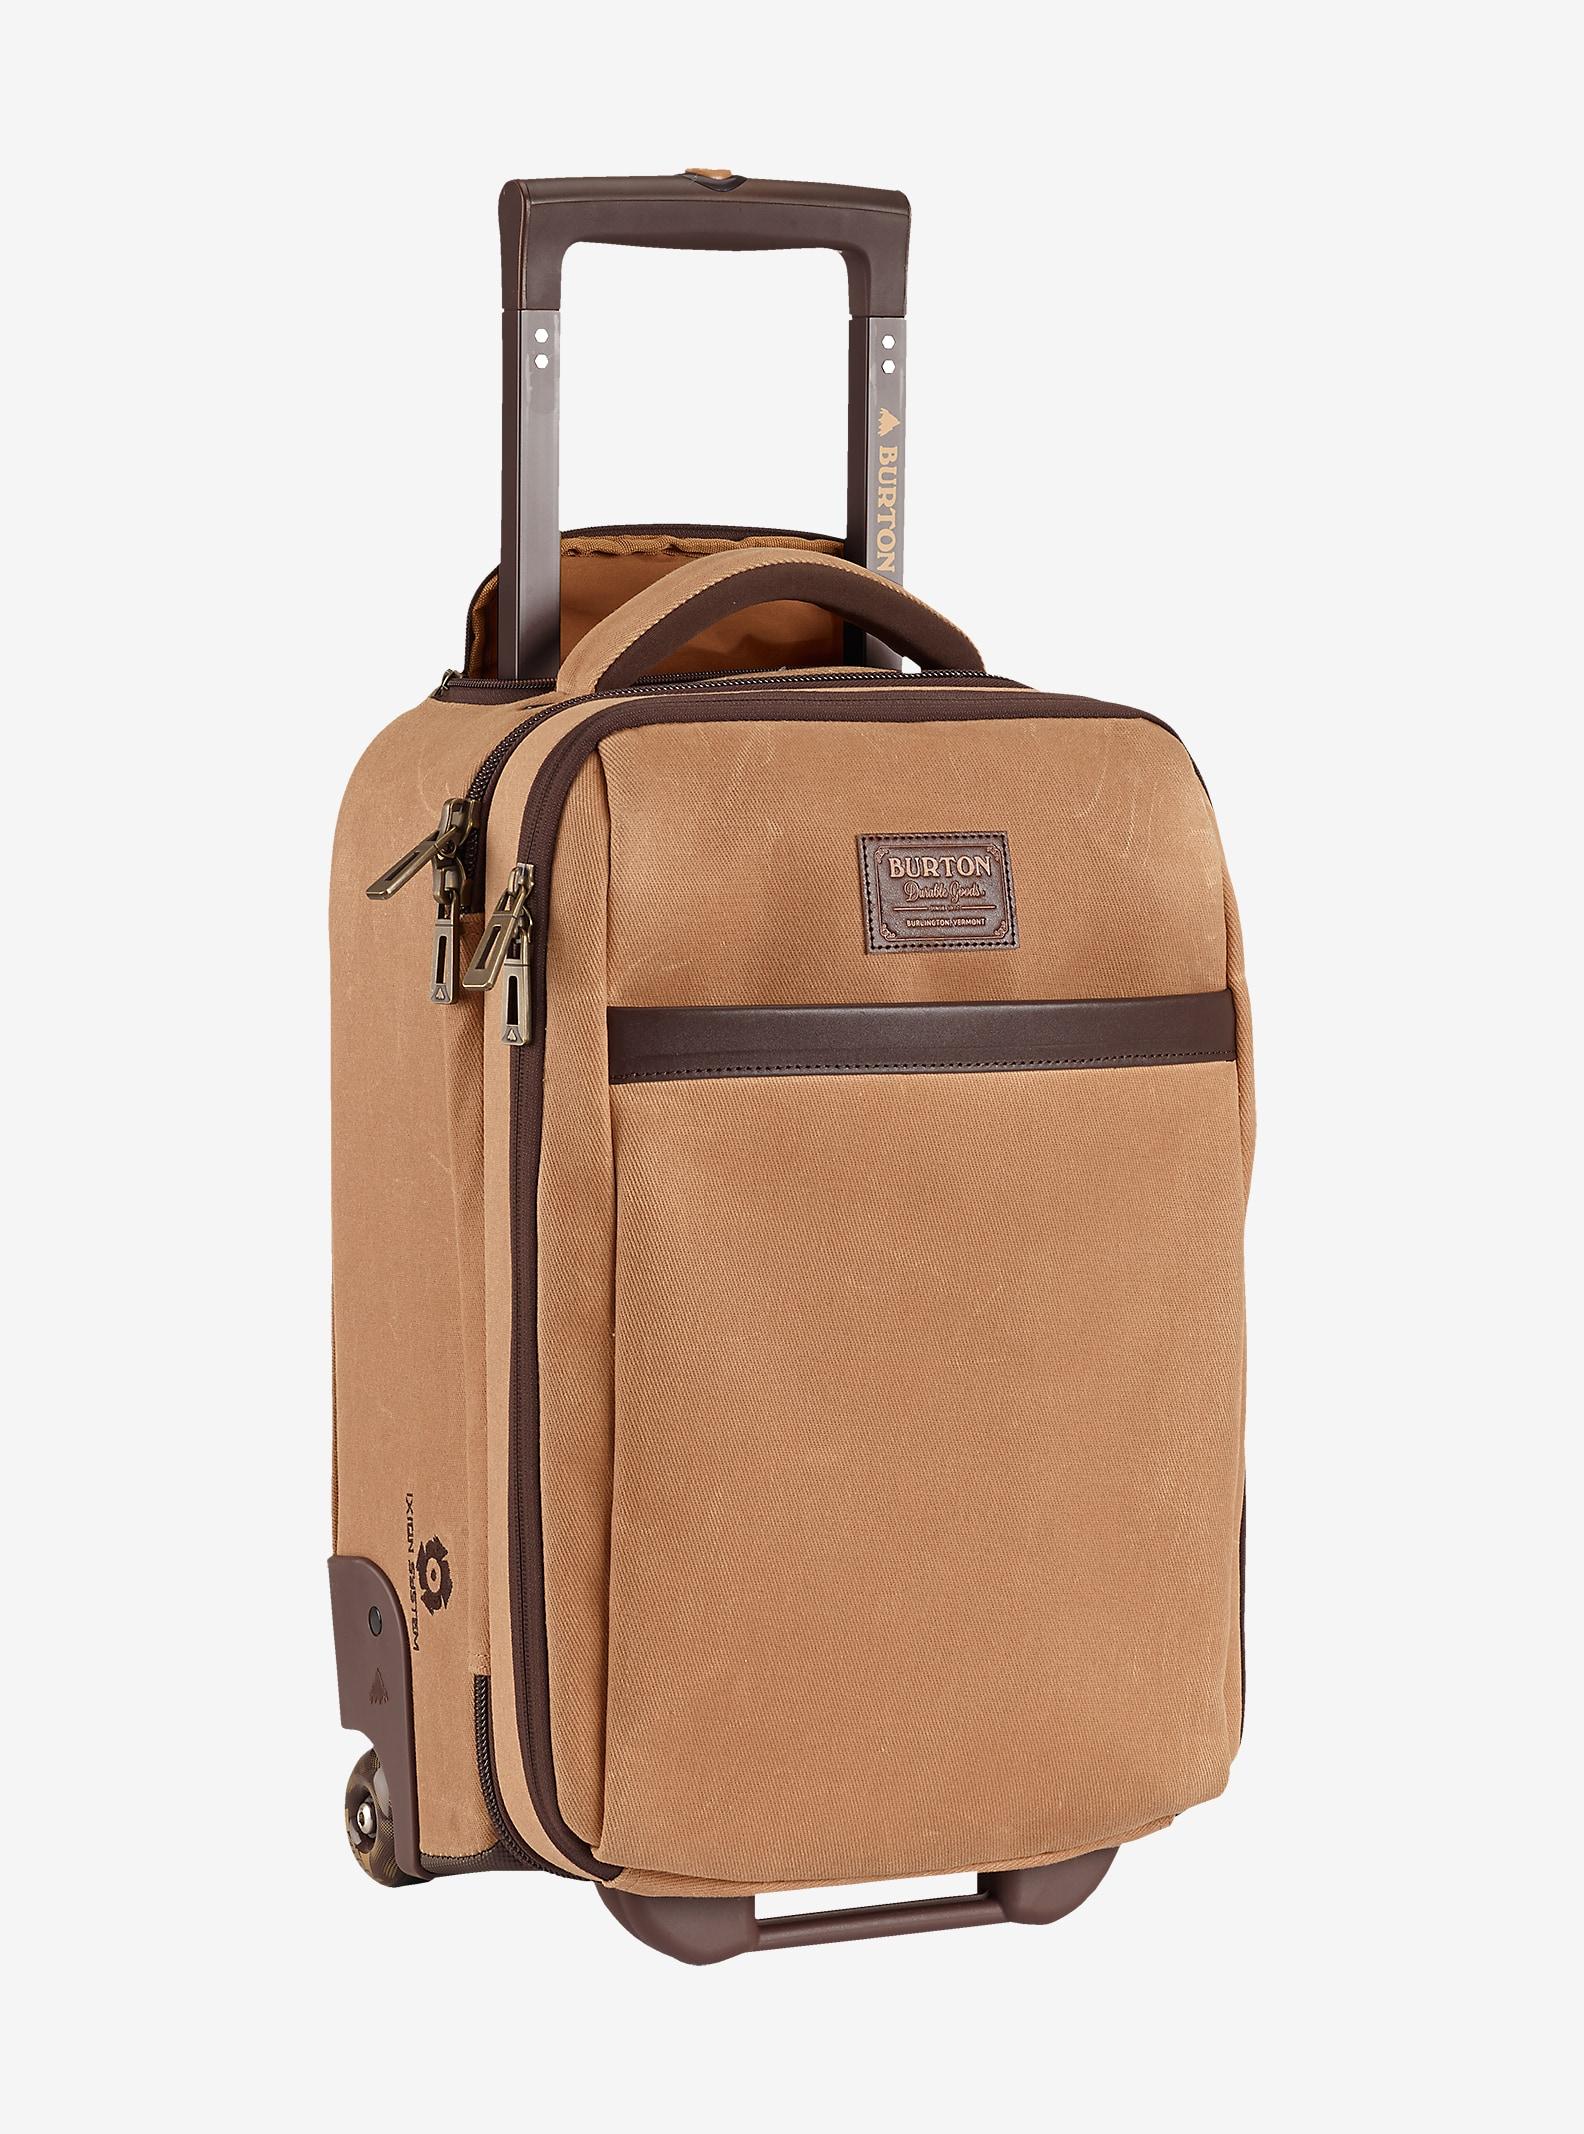 Burton Wheelie Flyer Travel Bag shown in Beagle Brown Waxed Canvas